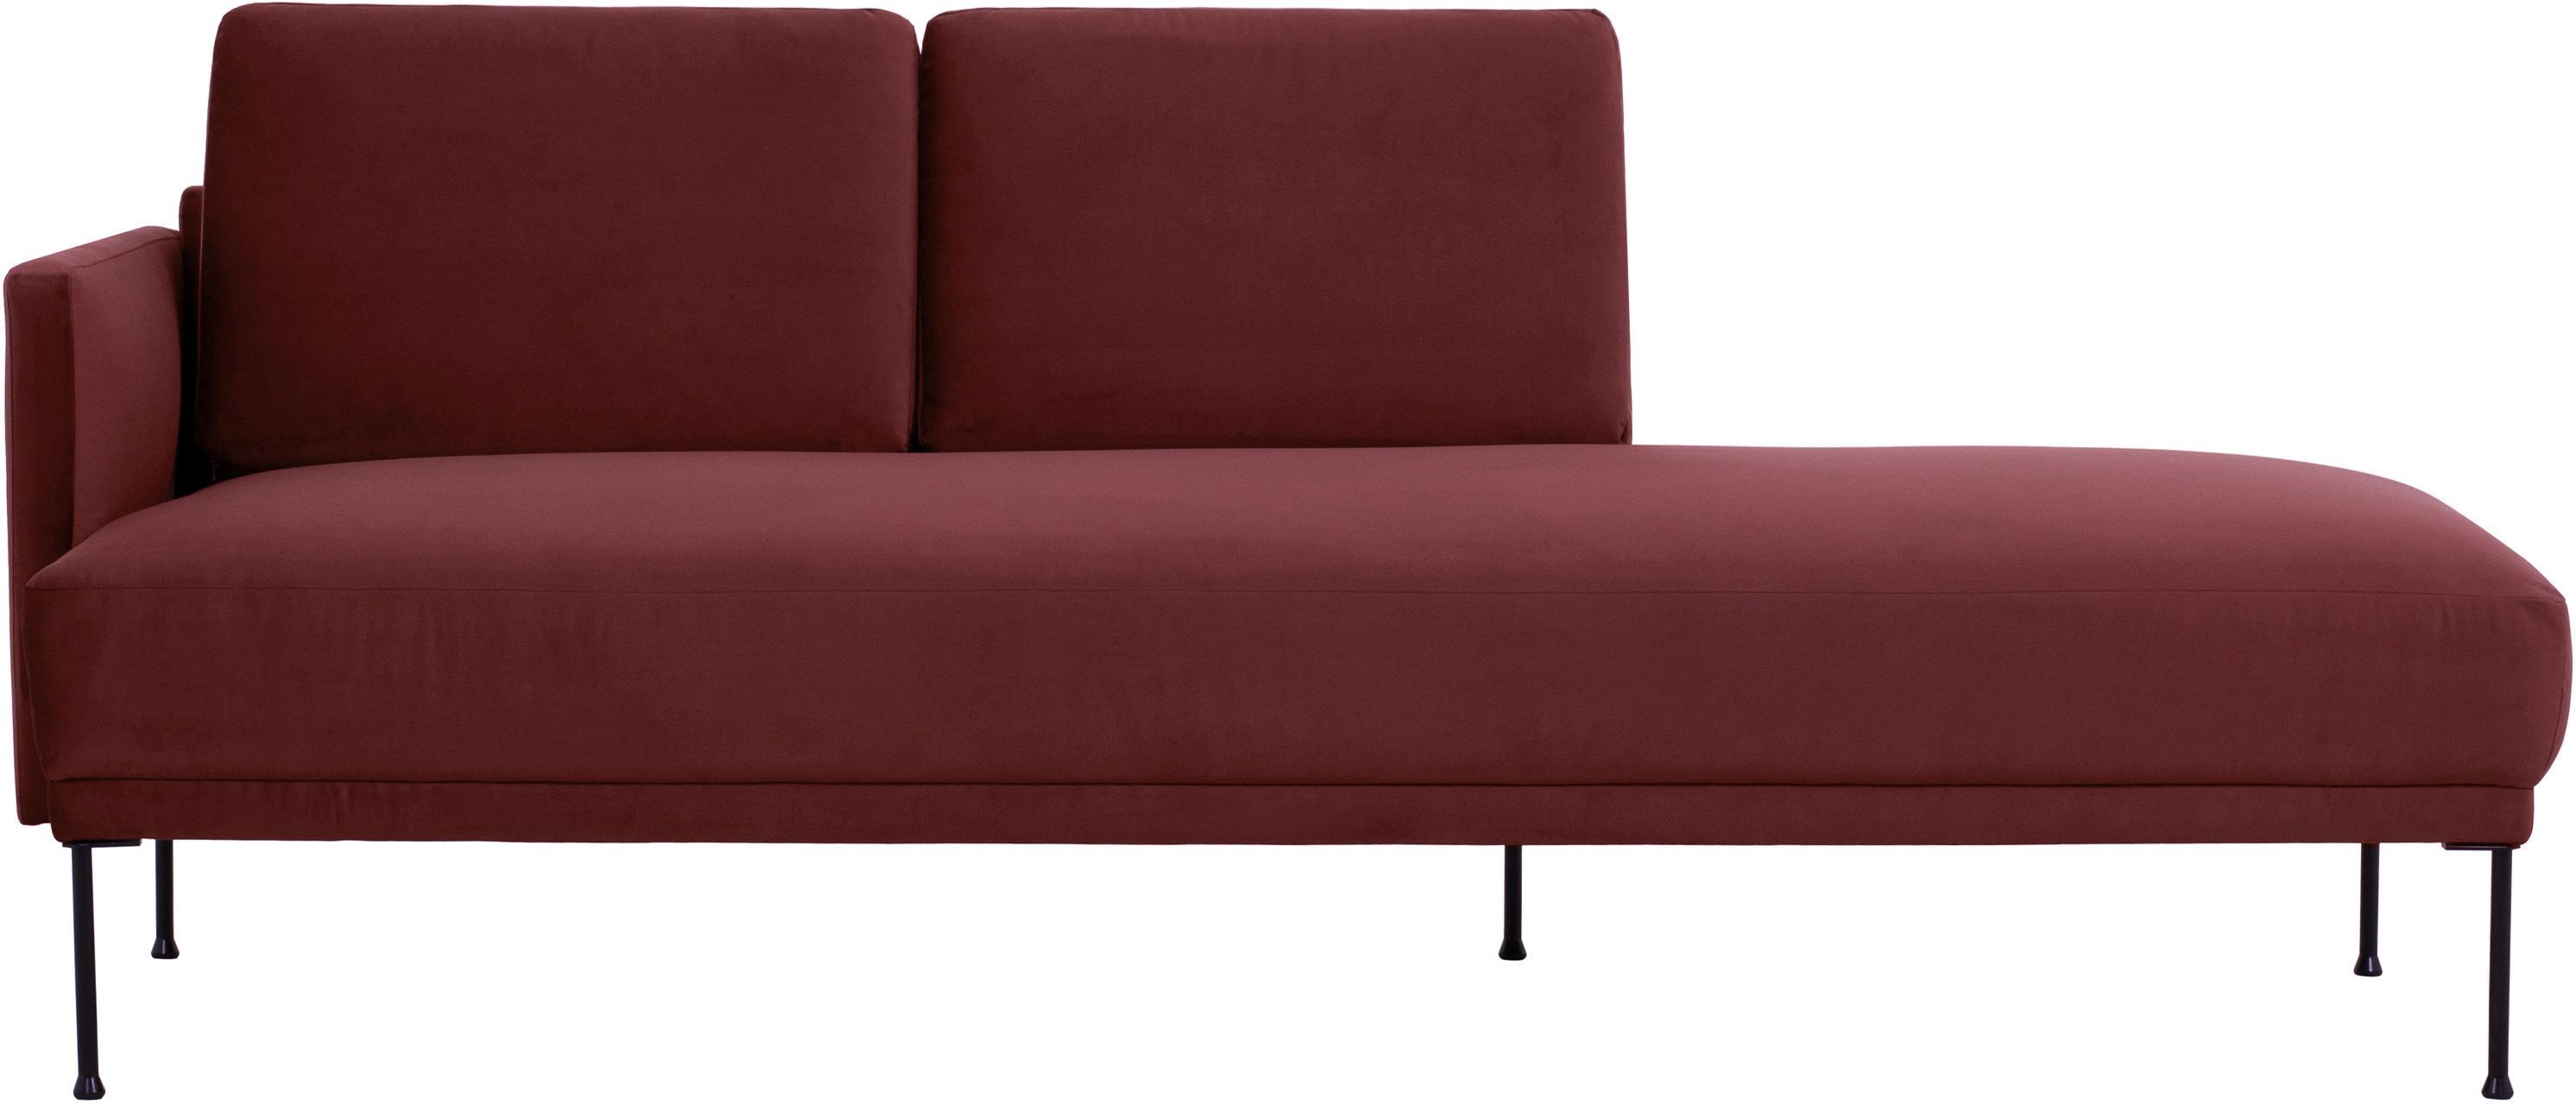 Fluwelen chaise longue Fluente, Bekleding: fluweel (hoogwaardig poly, Frame: massief grenenhout, Poten: gelakt metaal, Bordeauxrood, B 201 x D 83 cm